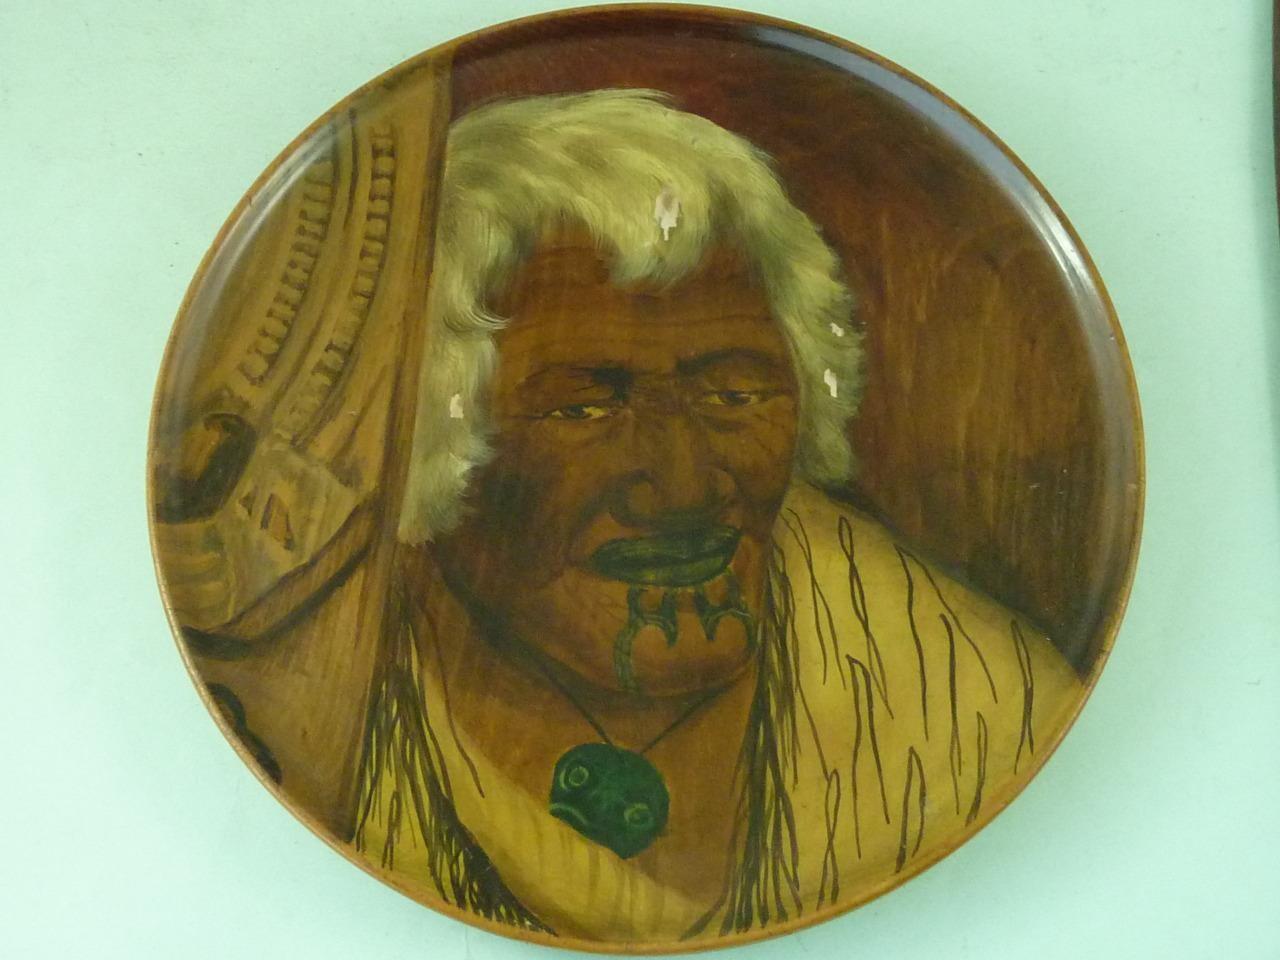 chef maori thomson nouvelle z lande kauri bois tatouage hei. Black Bedroom Furniture Sets. Home Design Ideas